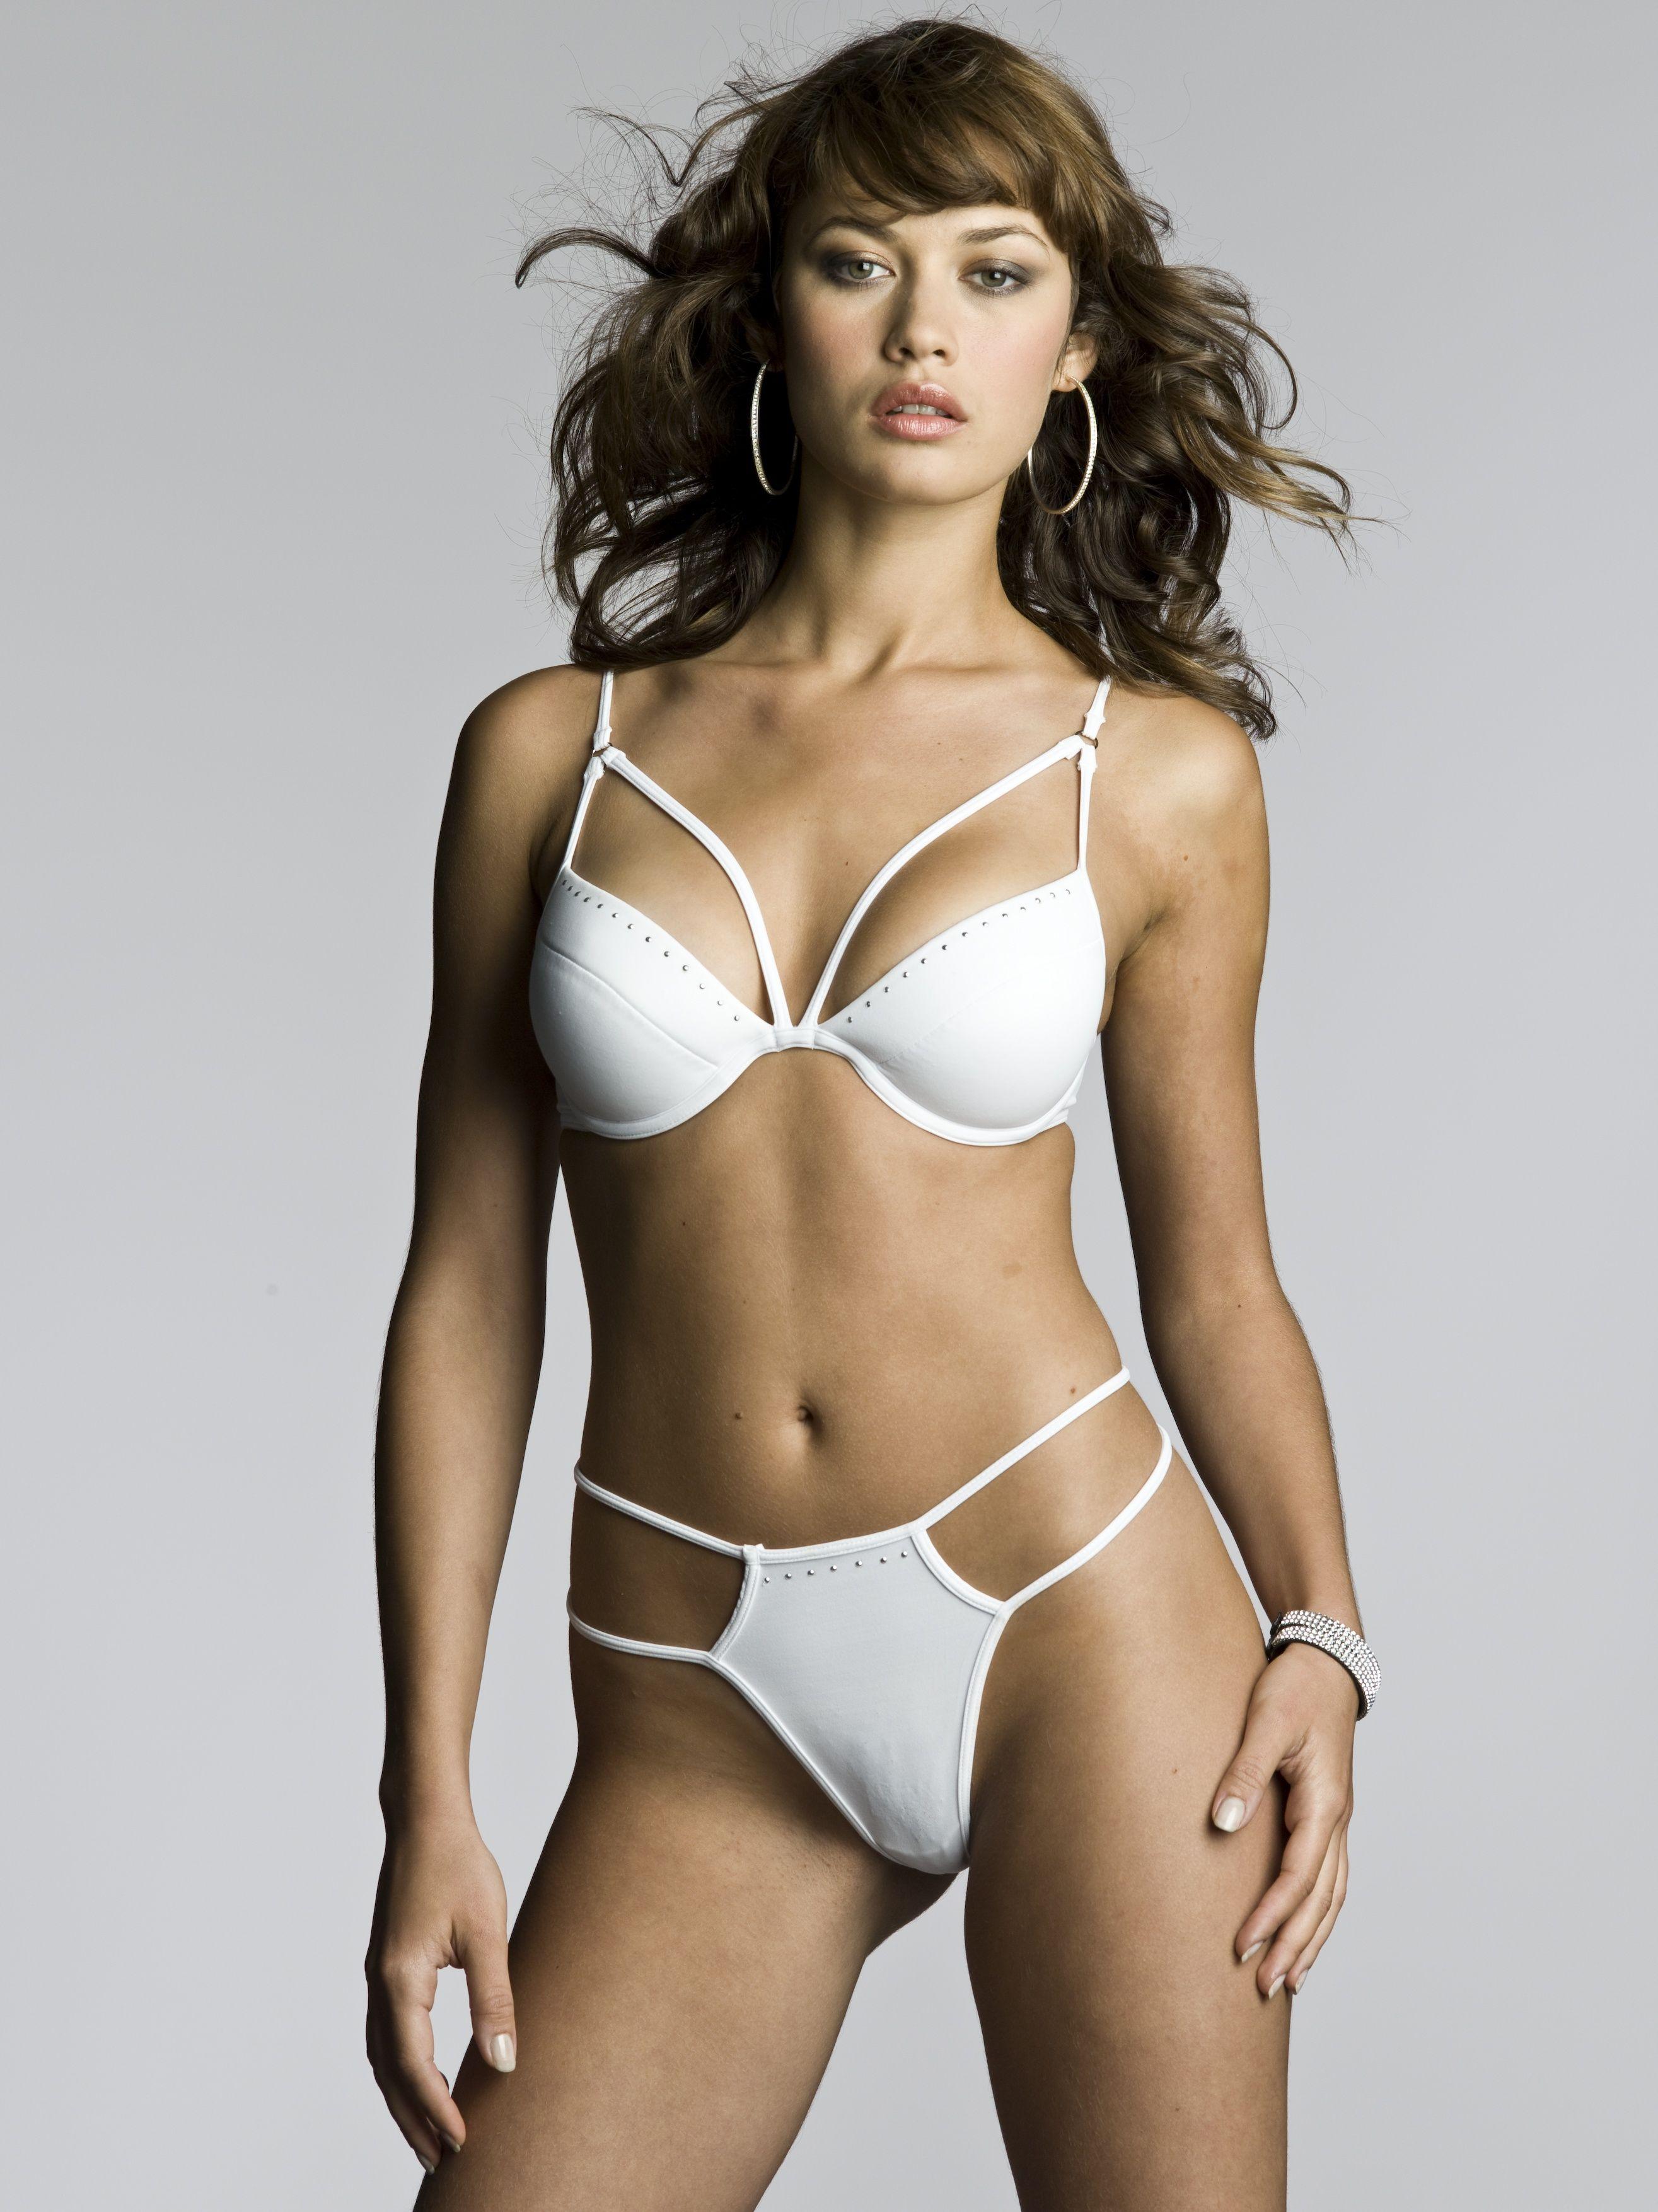 Olga Kurylenko | Sexy, Hot body and Lady